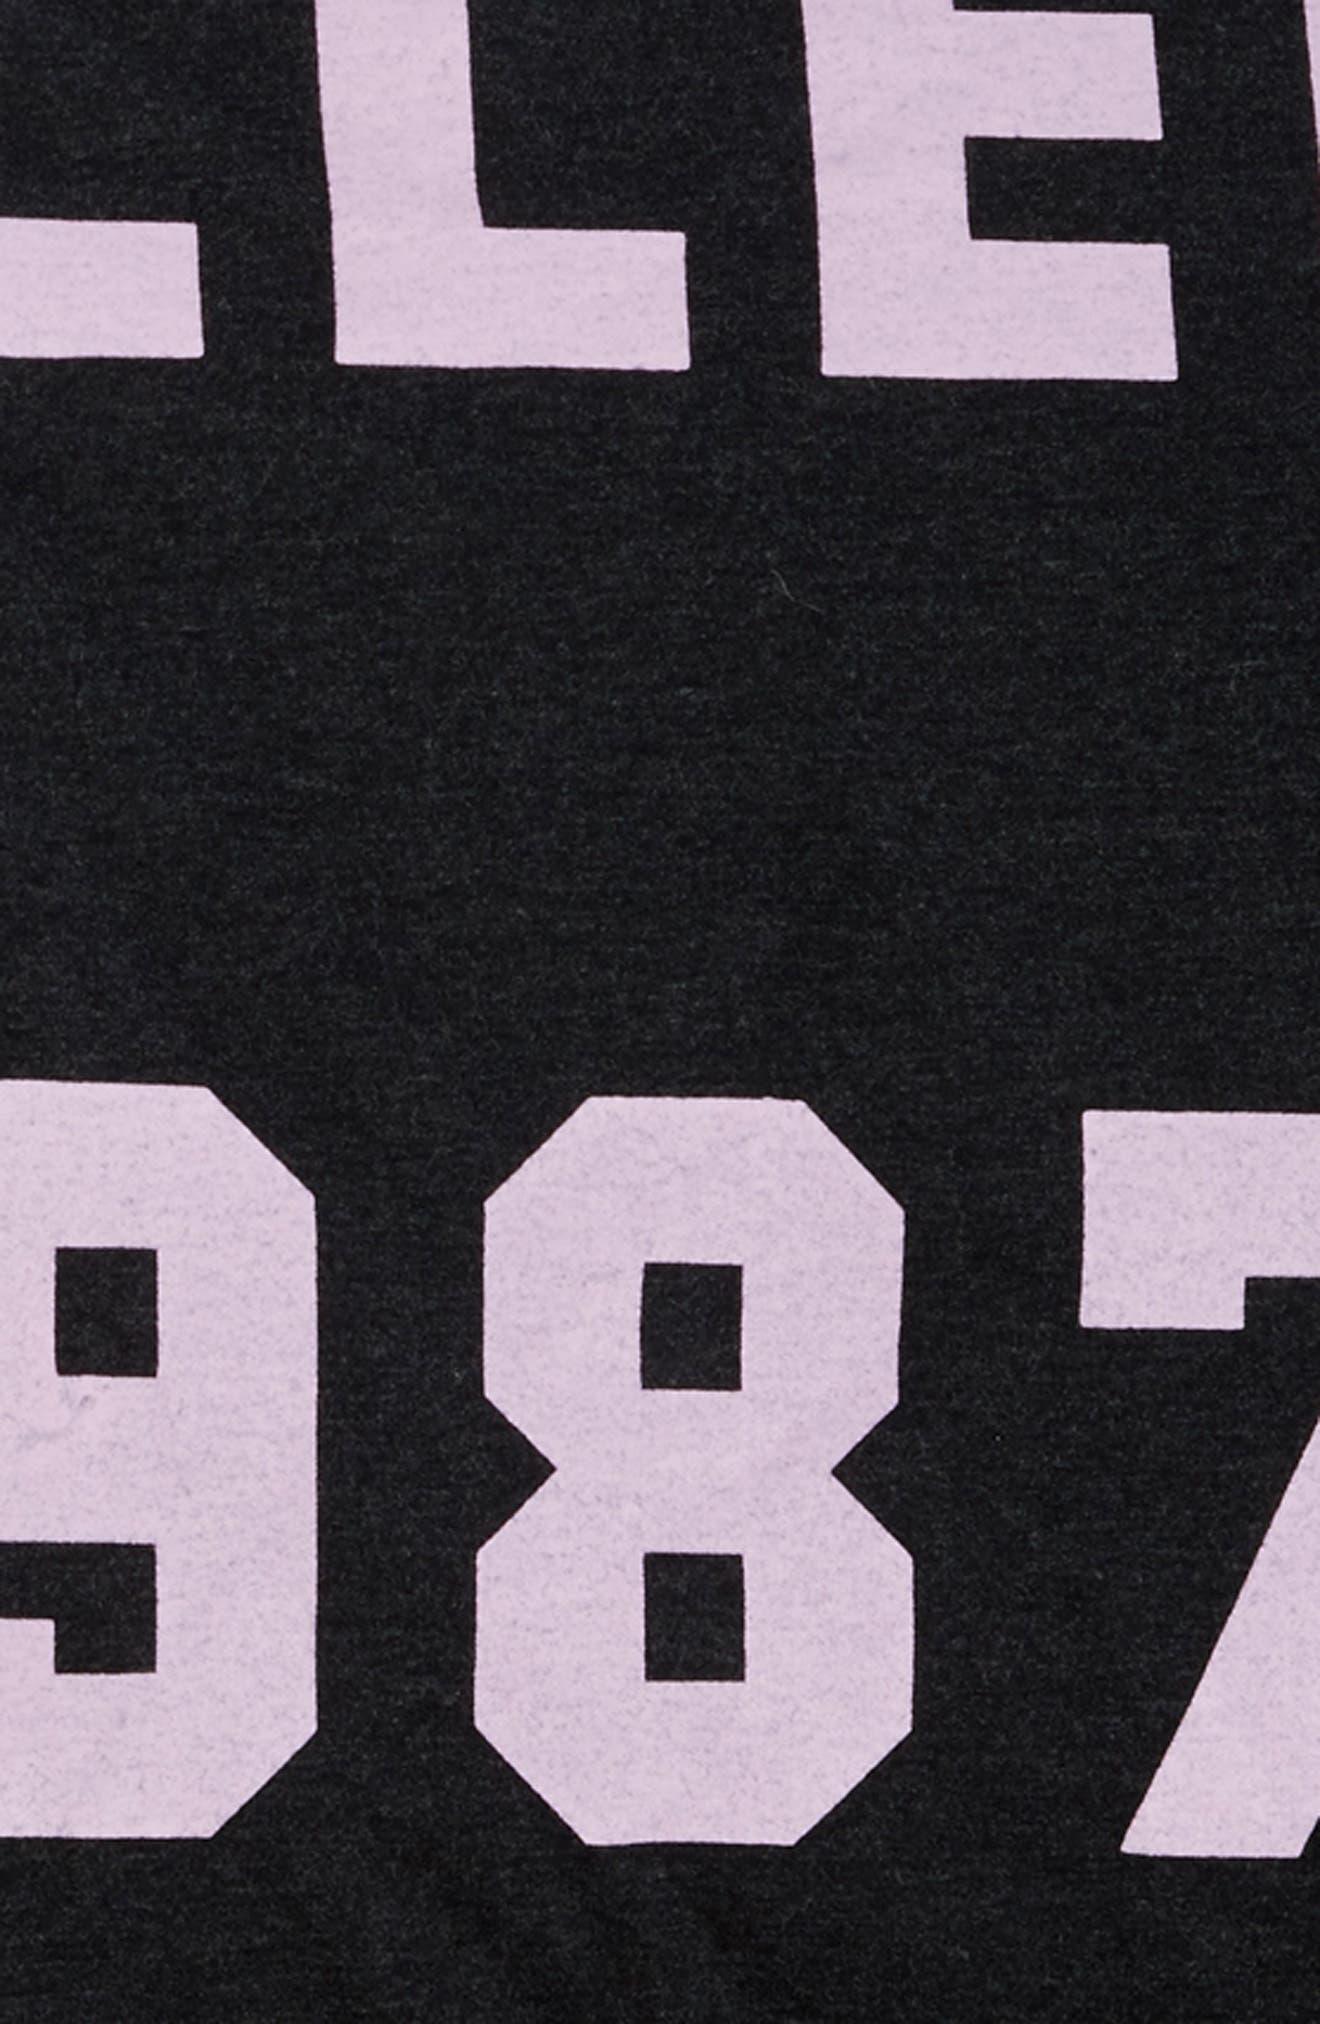 R.I.S.E. 74 Duvet Cover,                             Alternate thumbnail 3, color,                             Muted Black